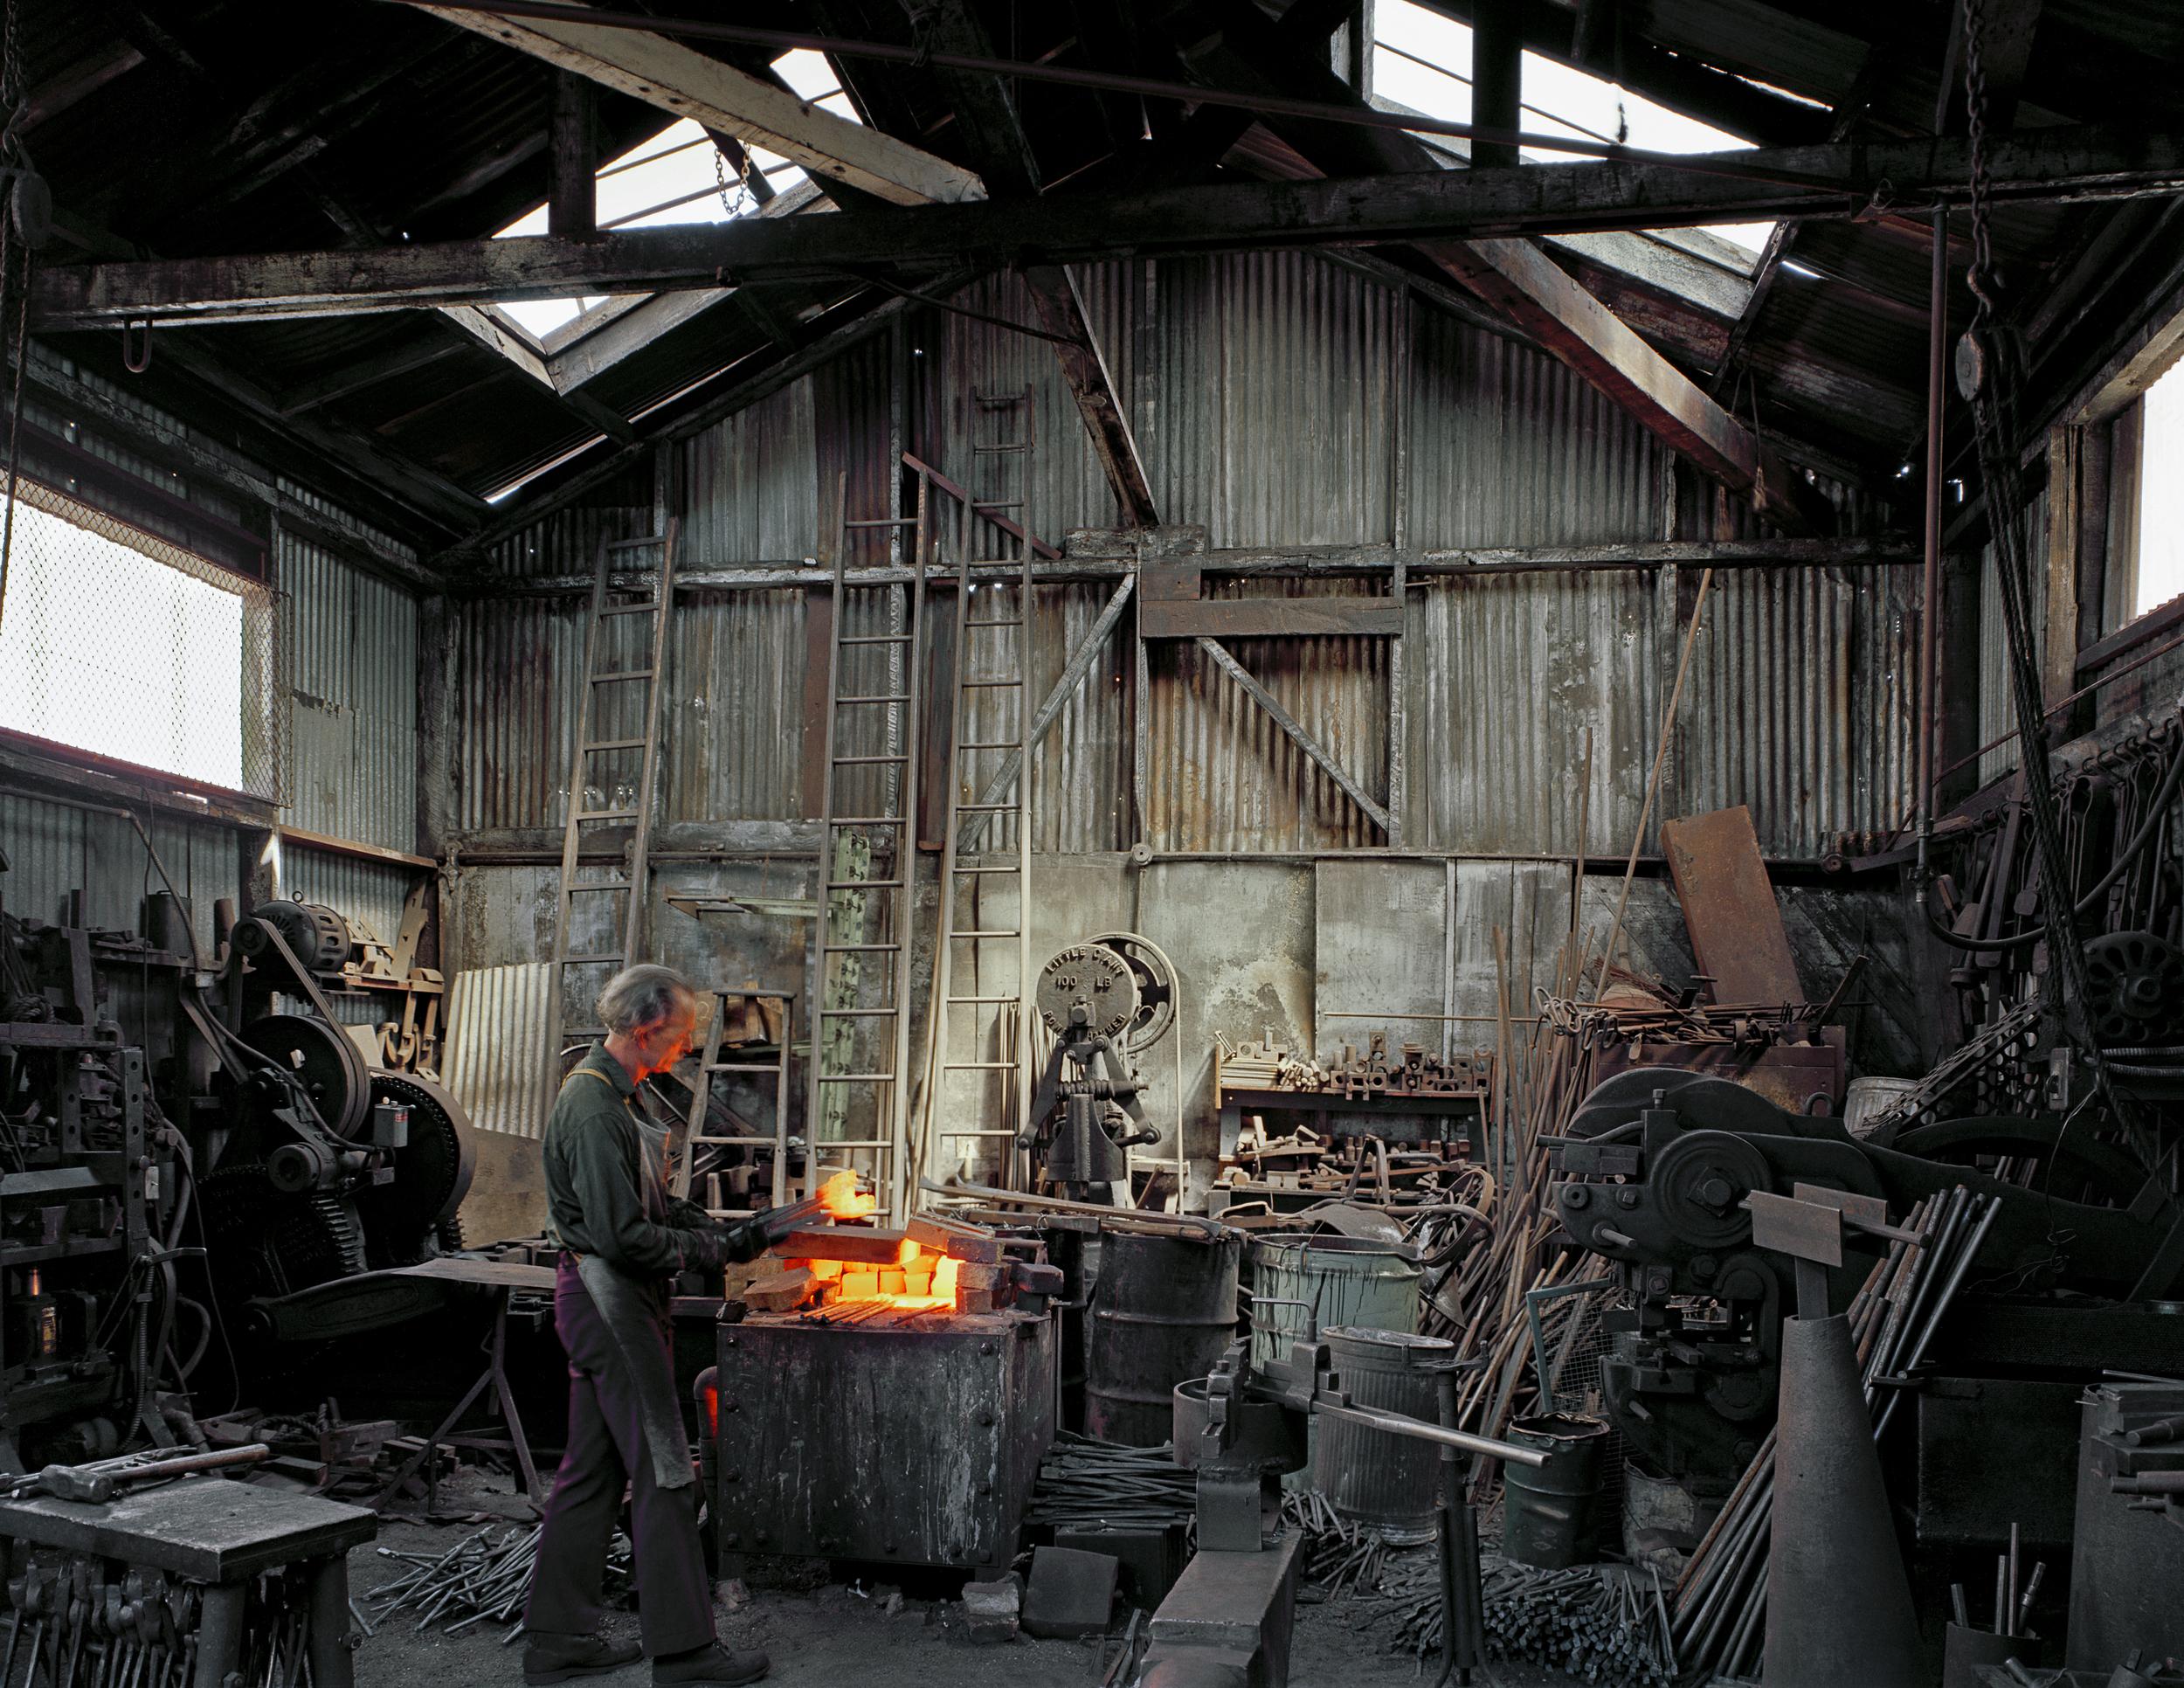 JANET DELANEY Johnny Ryan, Blacksmith, Klockars Blacksmith and Metal Works, 443 Folsom Street, 1980 Archival Pigment Print, 2016 16 x 20 inches, edition of 5 20 x 24 inches, edition of 2 30 x 40 inches, edition of 2